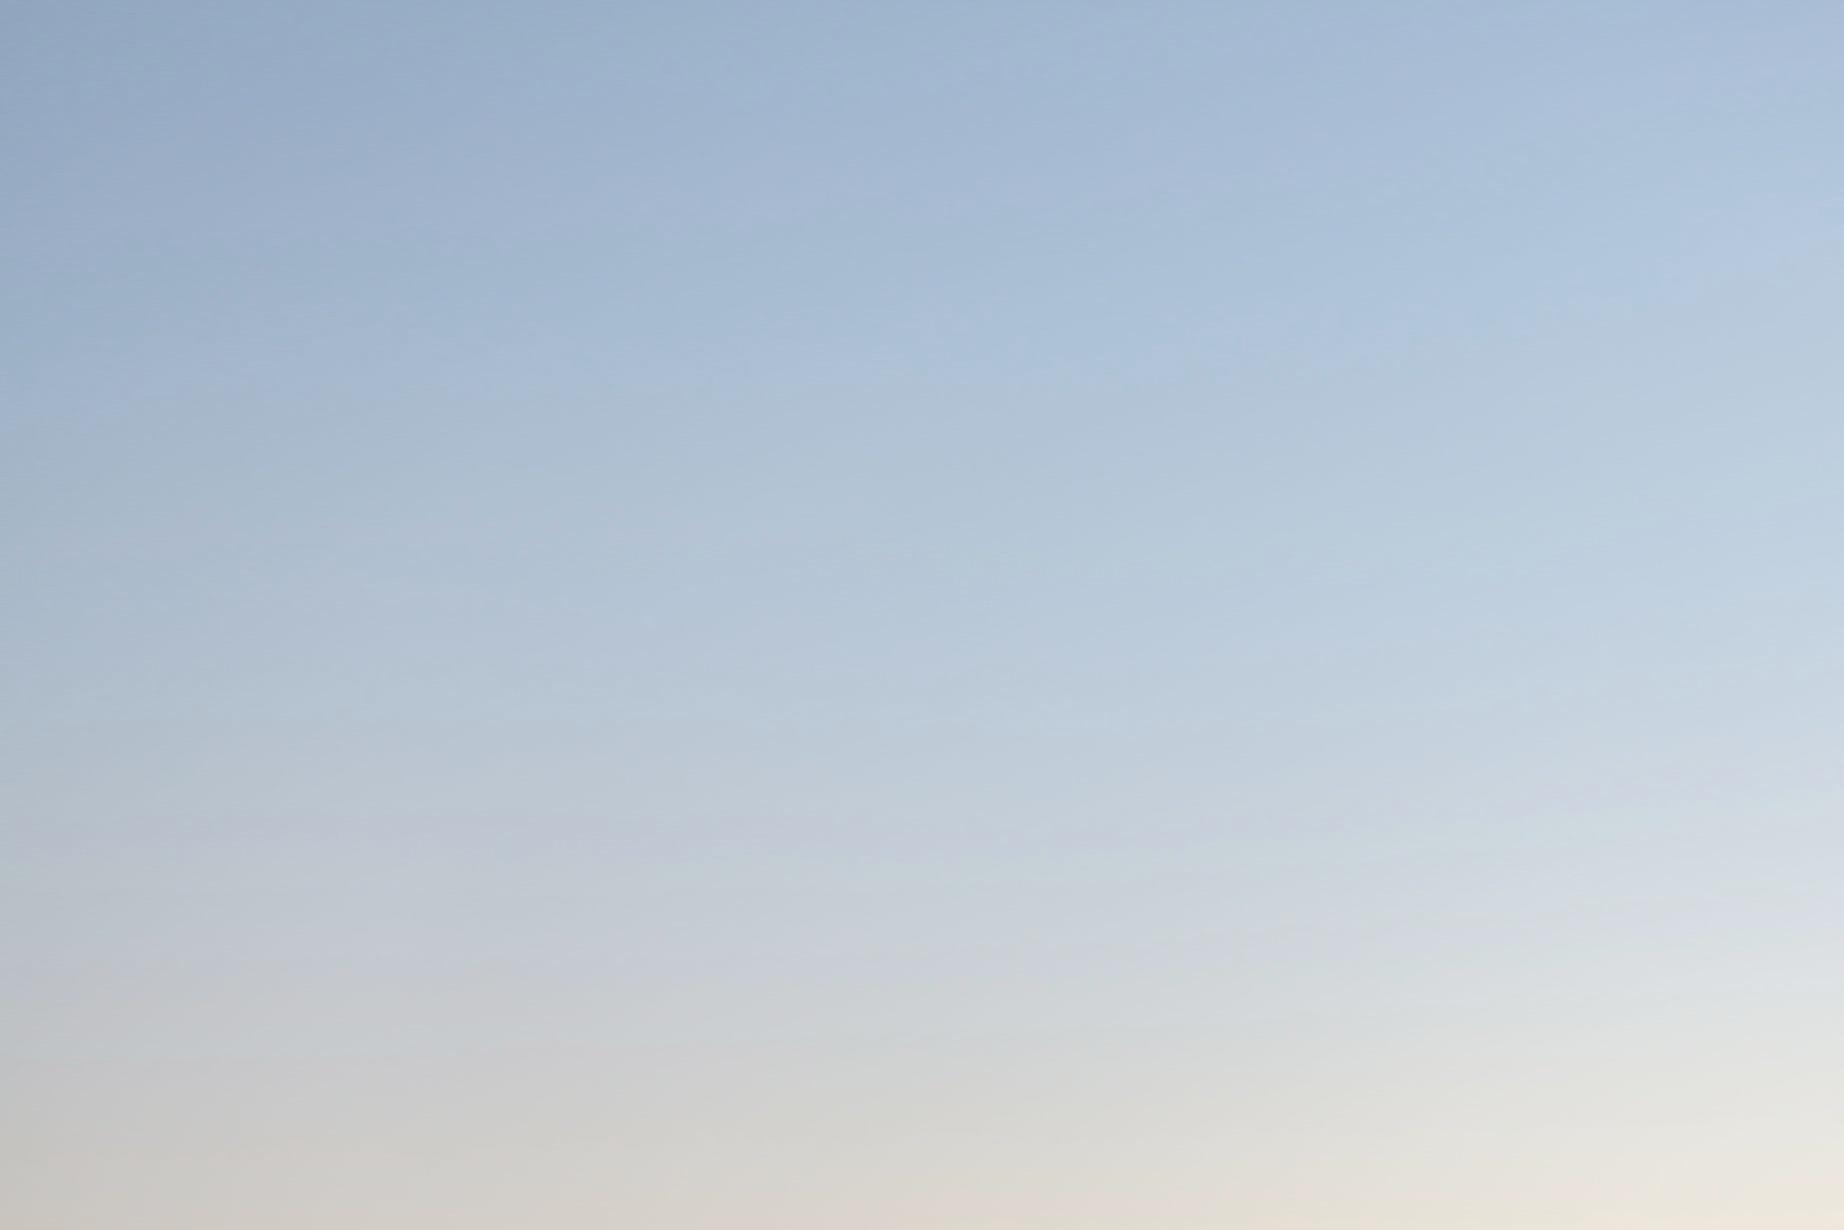 SPECIAL CLASS - June(6)2.Sun 16:30 - 18:005.Wed 20:00 - 21:307.Fri 11:30 - 13:008.Sat 16:30 - 18:0012.Wed 20:00 - 21:3014.Fri 11:30 - 13:0015.Sat 16:30 - 18:00All LevelDrop in ¥2,000-【イネコヨガスタジオ】東京都渋谷区西原1-39-18